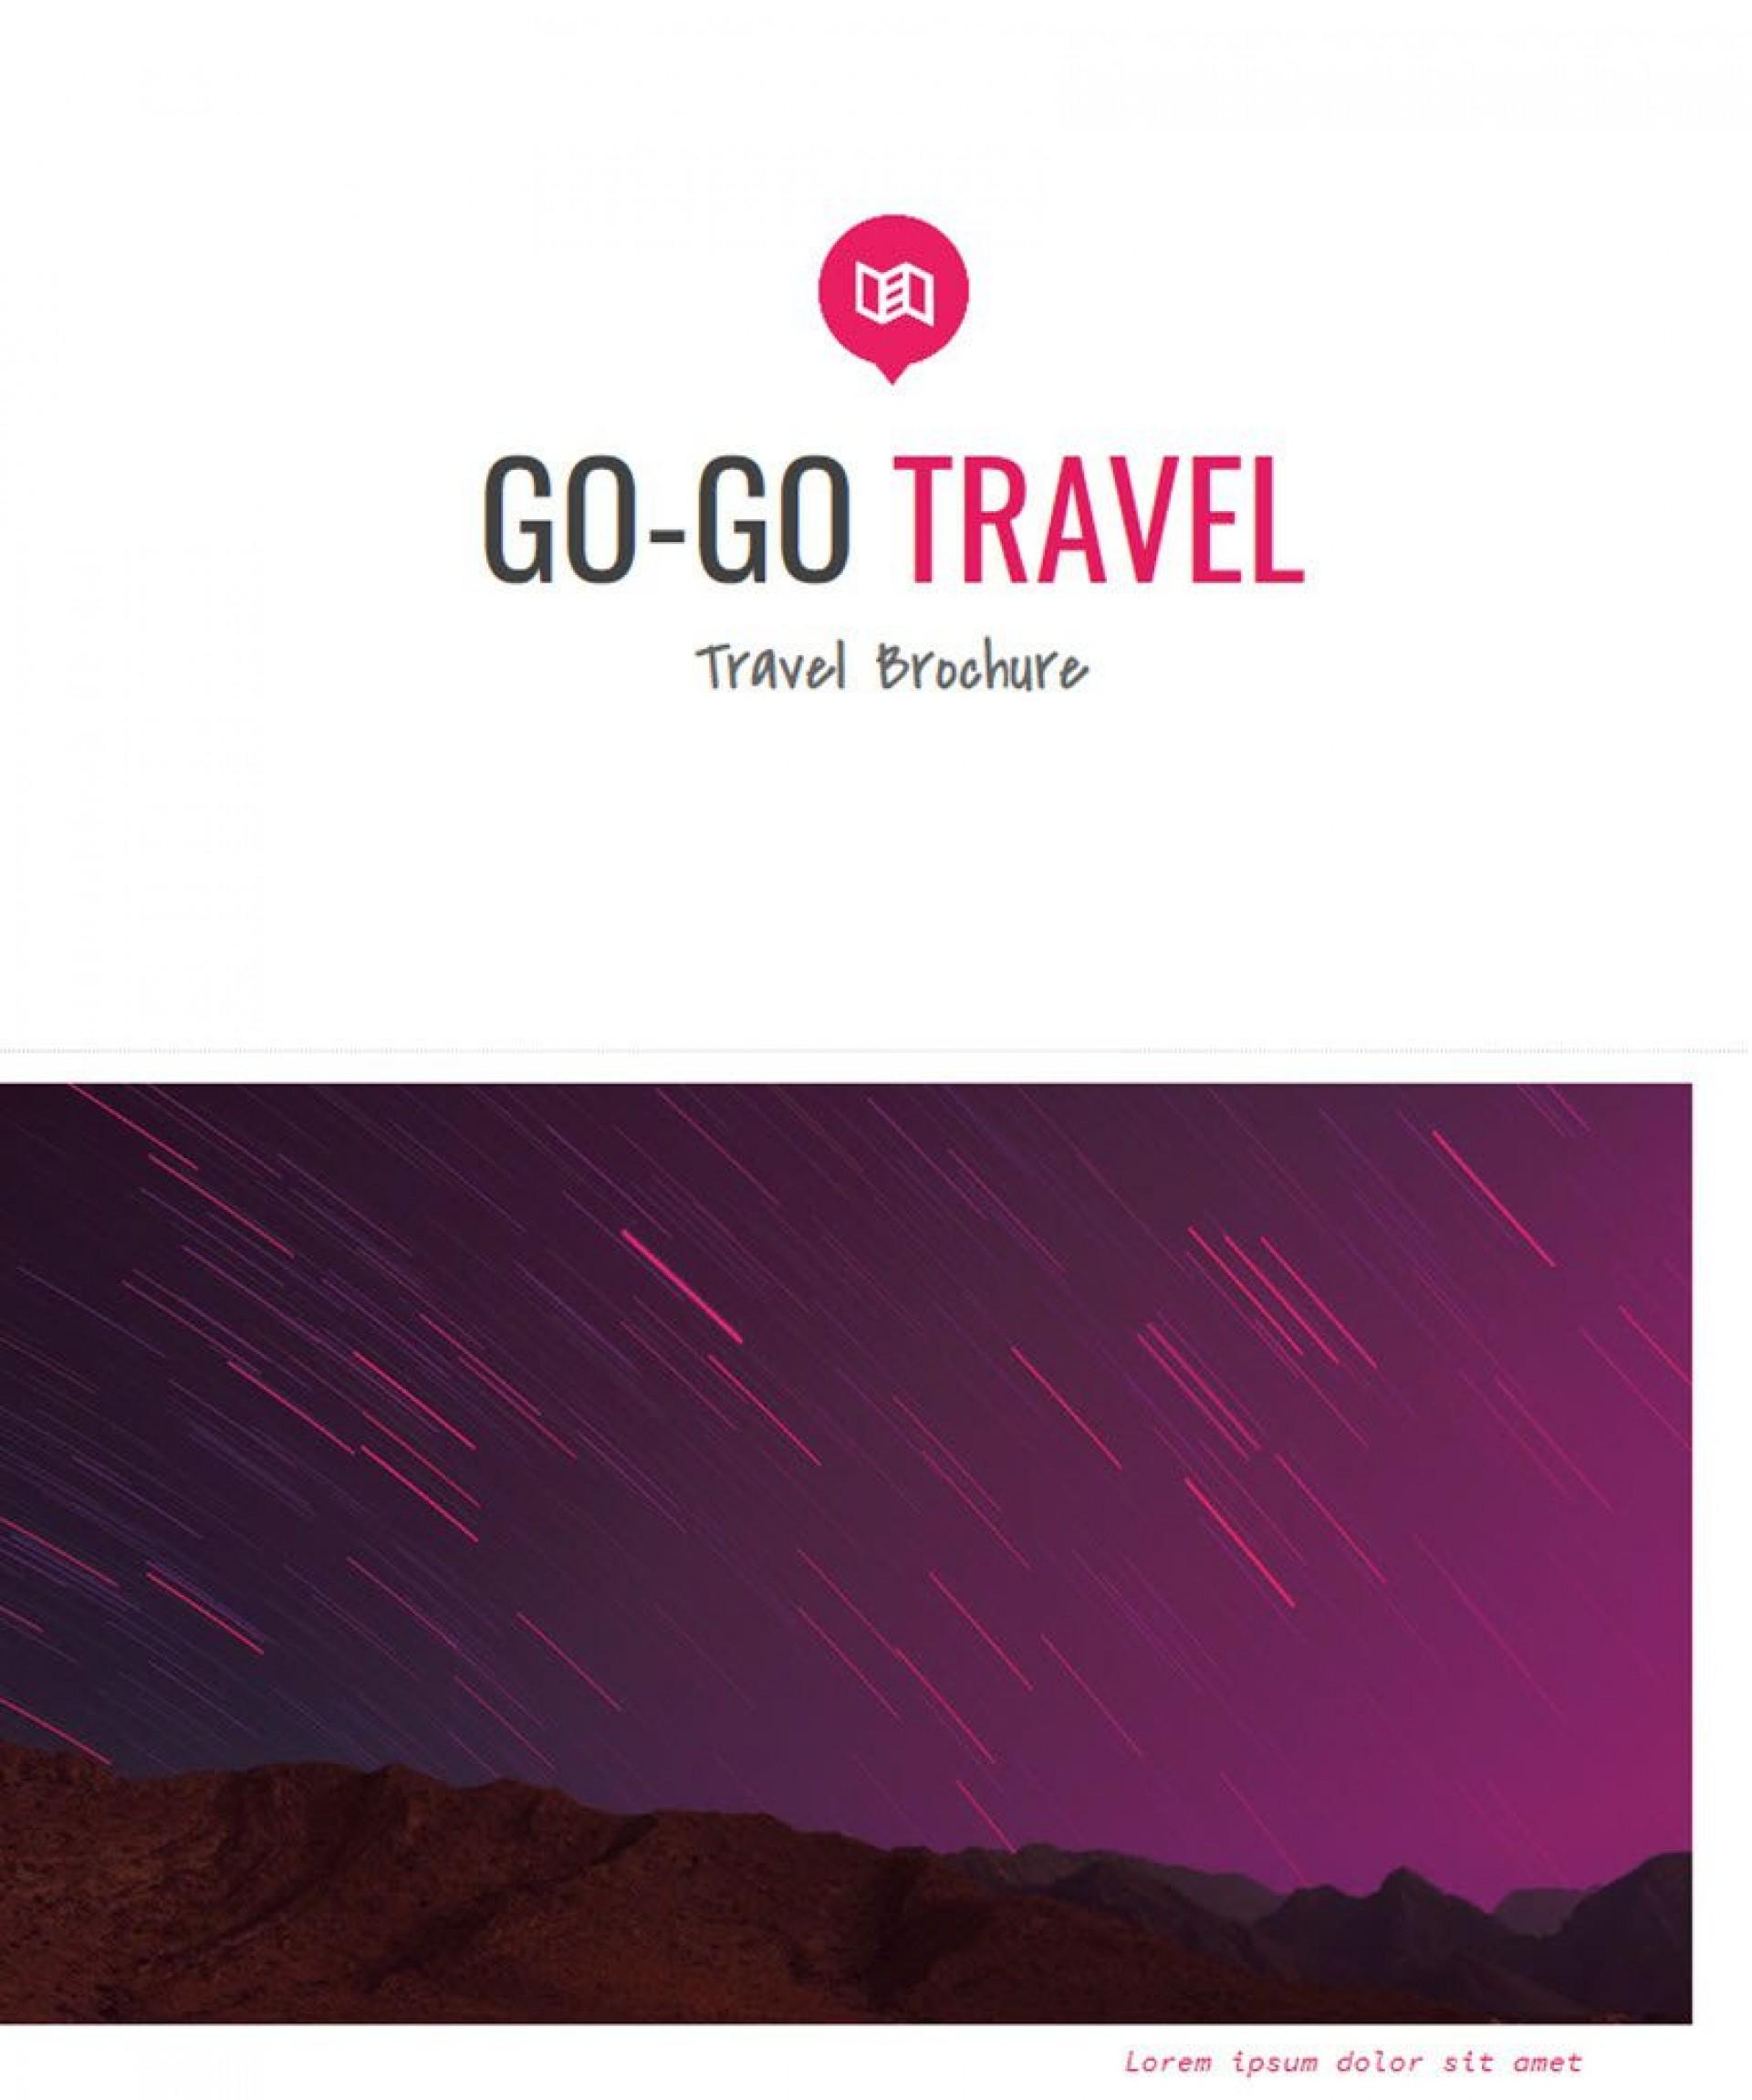 005 Wonderful Brochure Template Google Drive Photo  Free1920